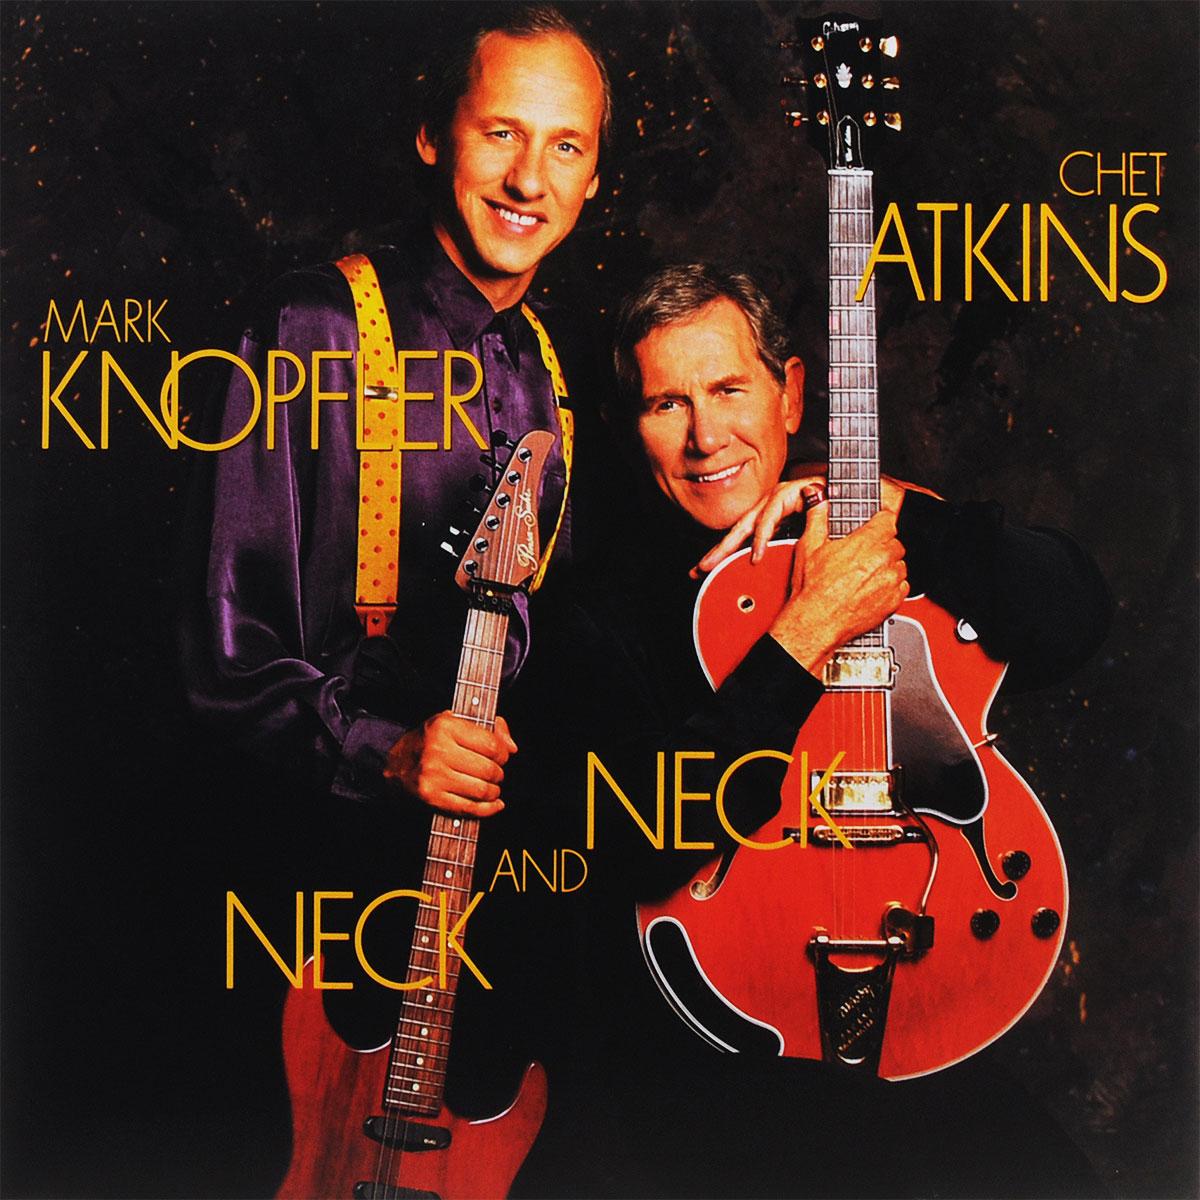 Чет Эткинс,Марк Нопфлер Chet Atkins & Mark Knopfler. Neck And Neck (LP) chet atkins mark knopfler chet atkins mark knopfler neck and neck